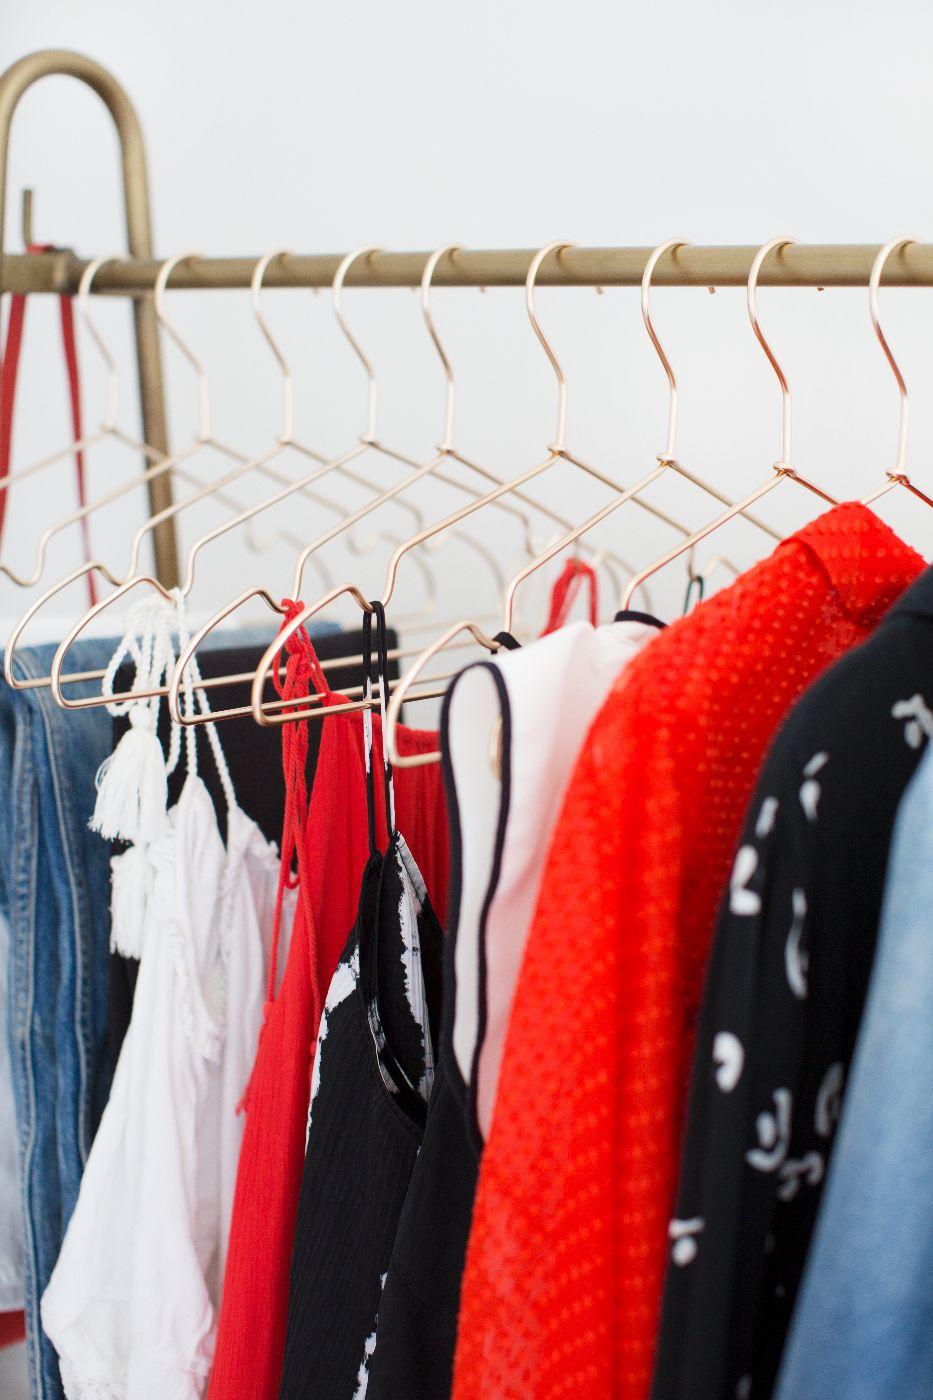 theannaedit-summer-capsule-wardrobe-red-edition-june-2017-3